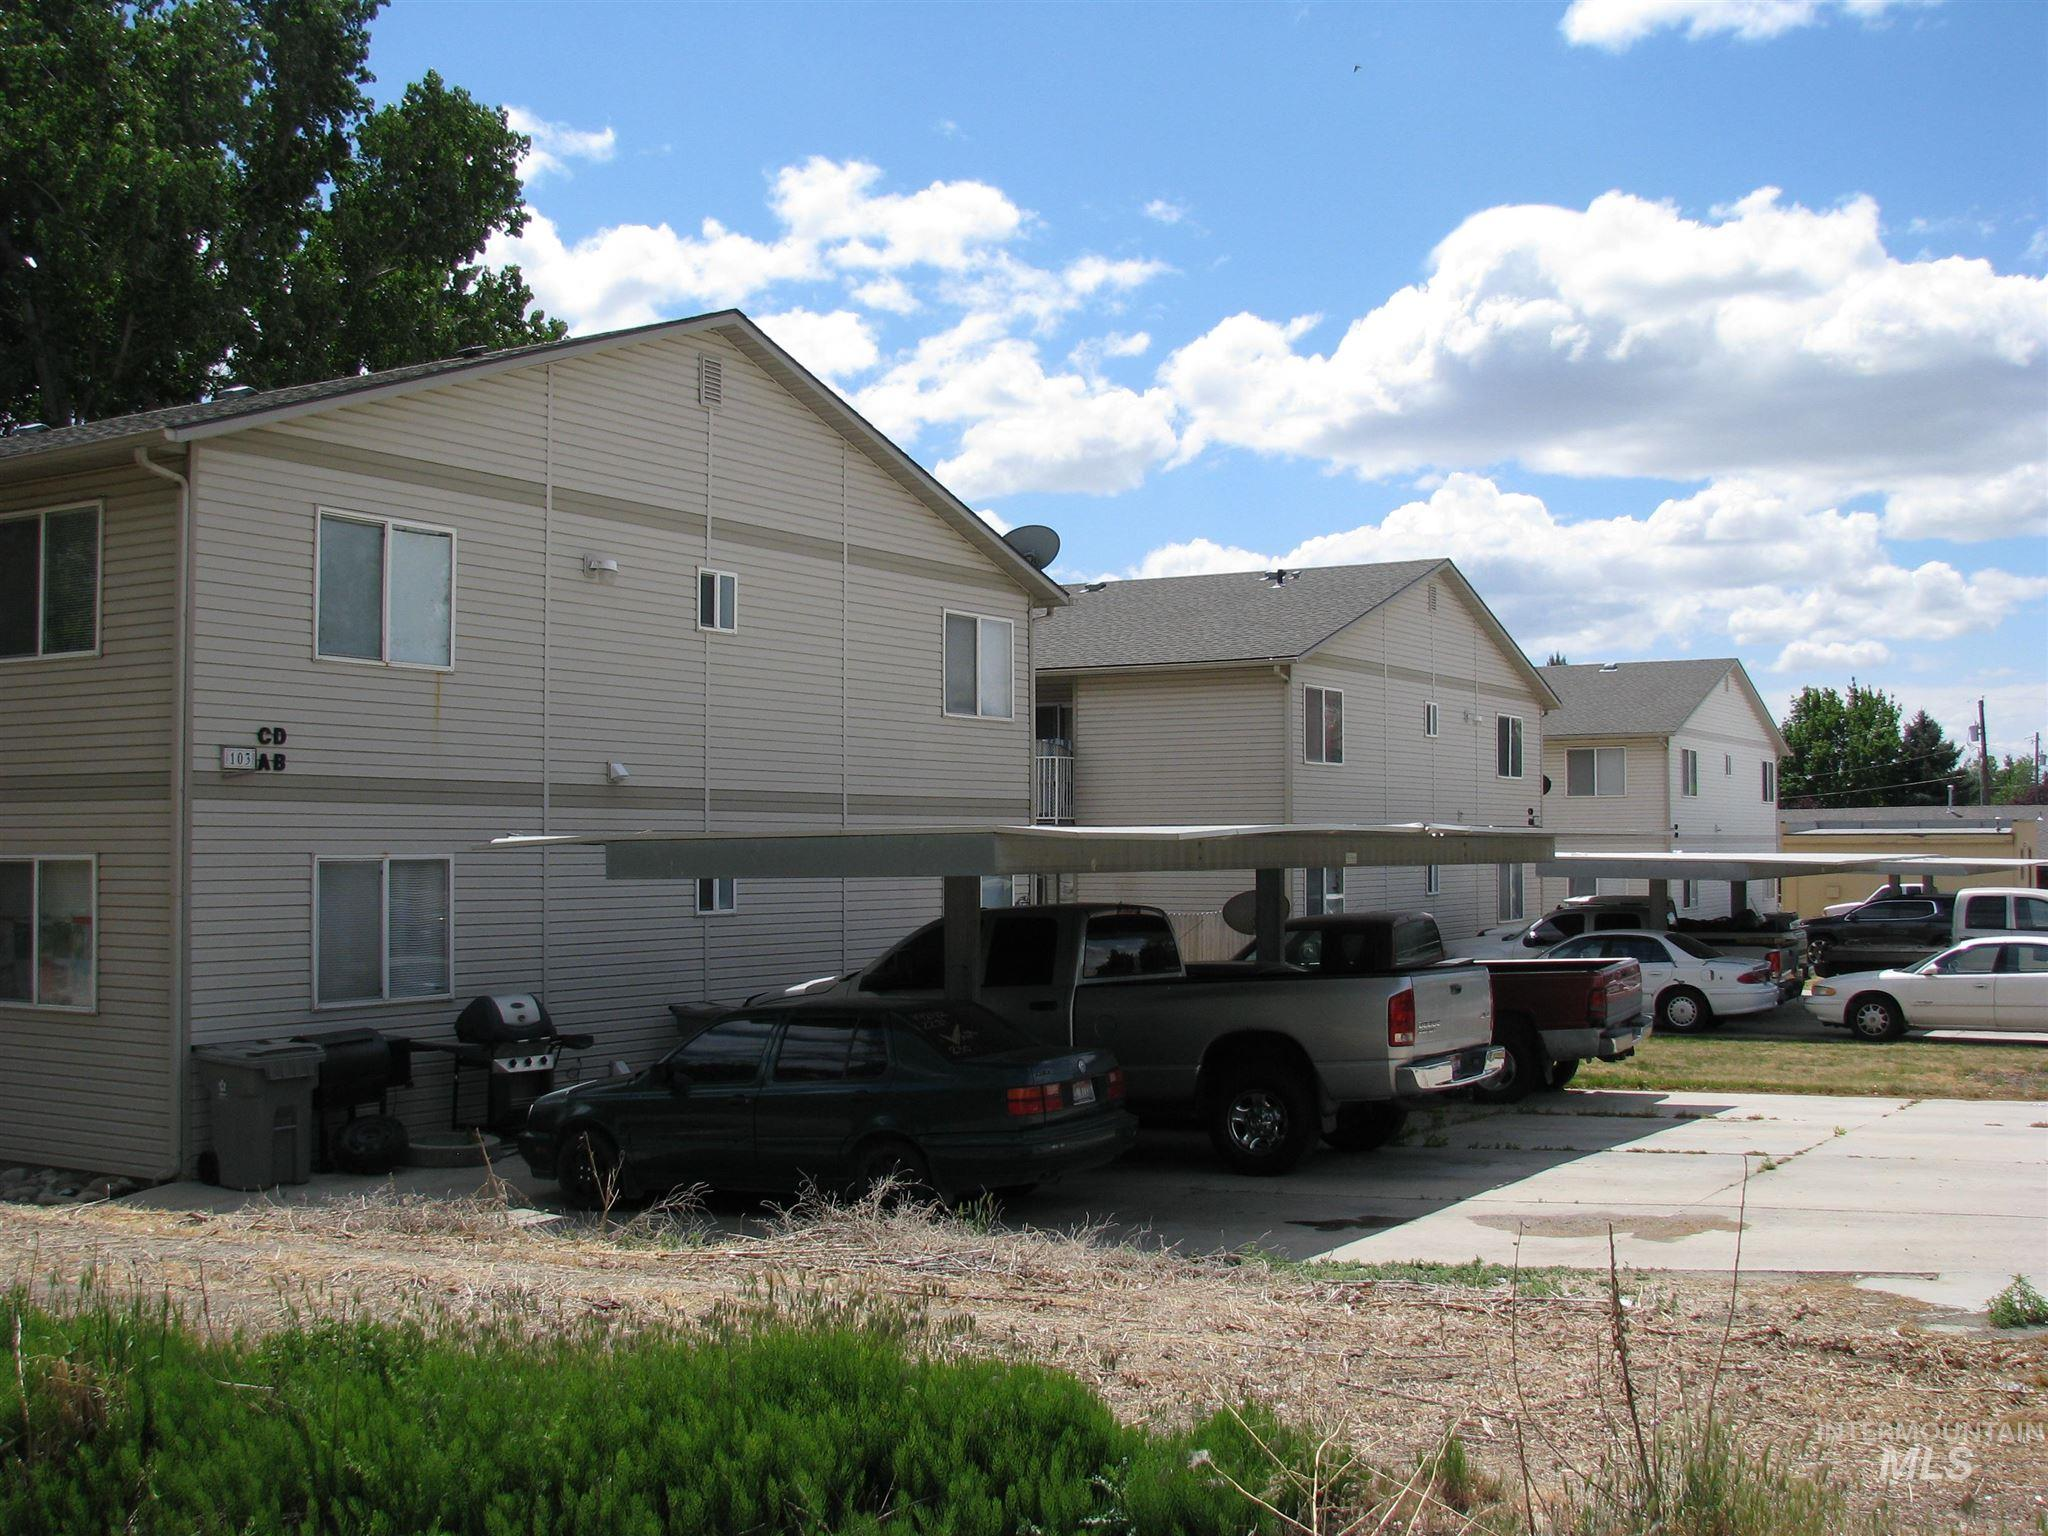 103-197-251 S Hawthorne Property Photo